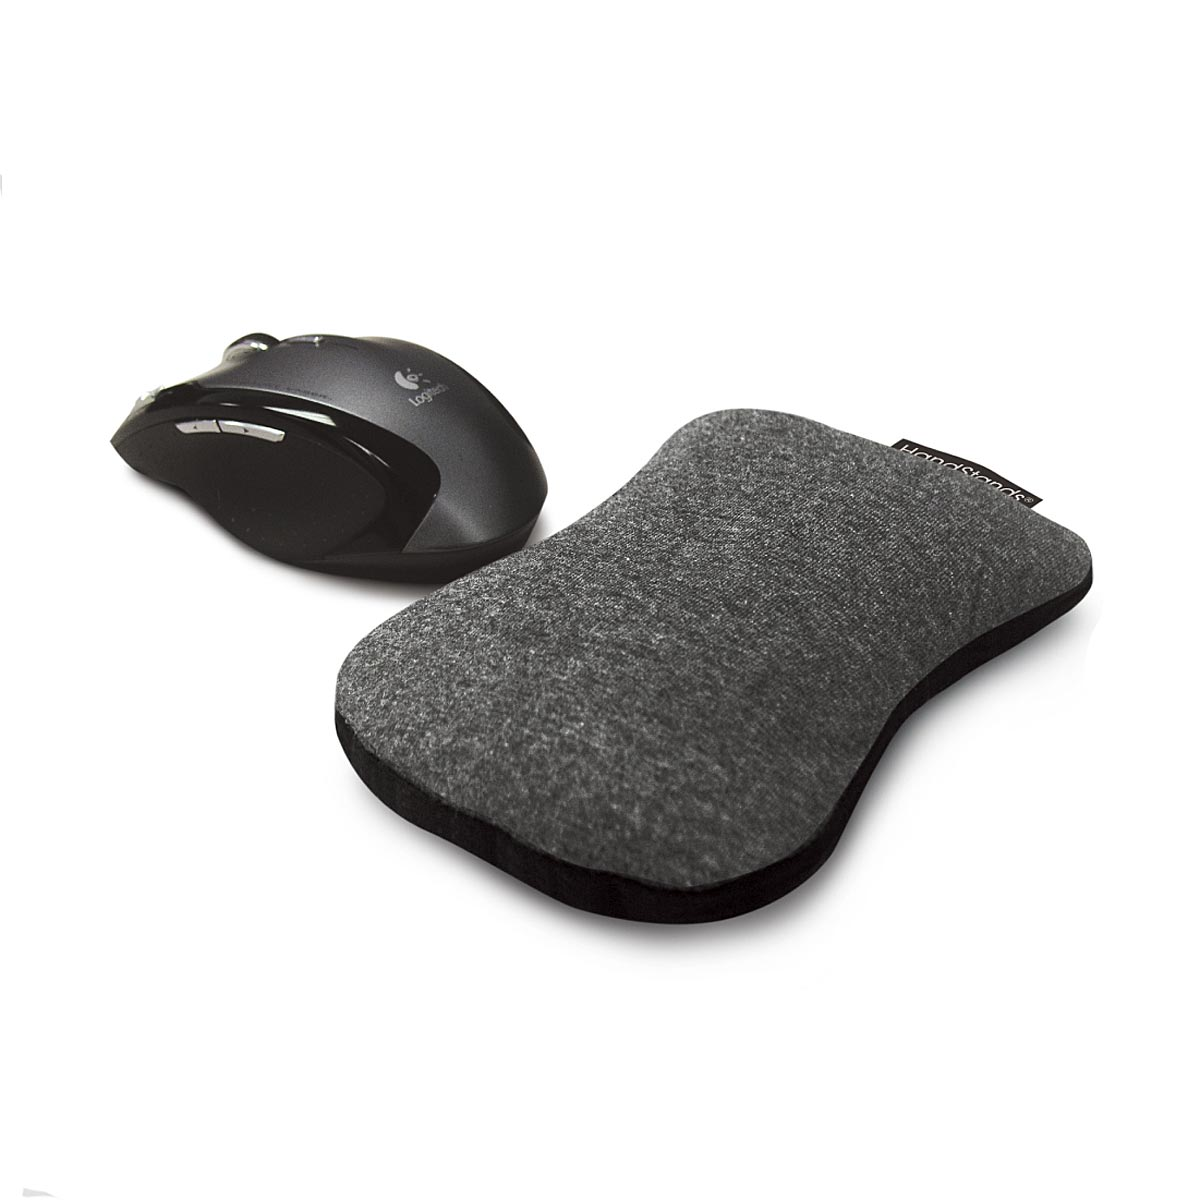 Handstands -  Add-A-Pad Wrist Cushion